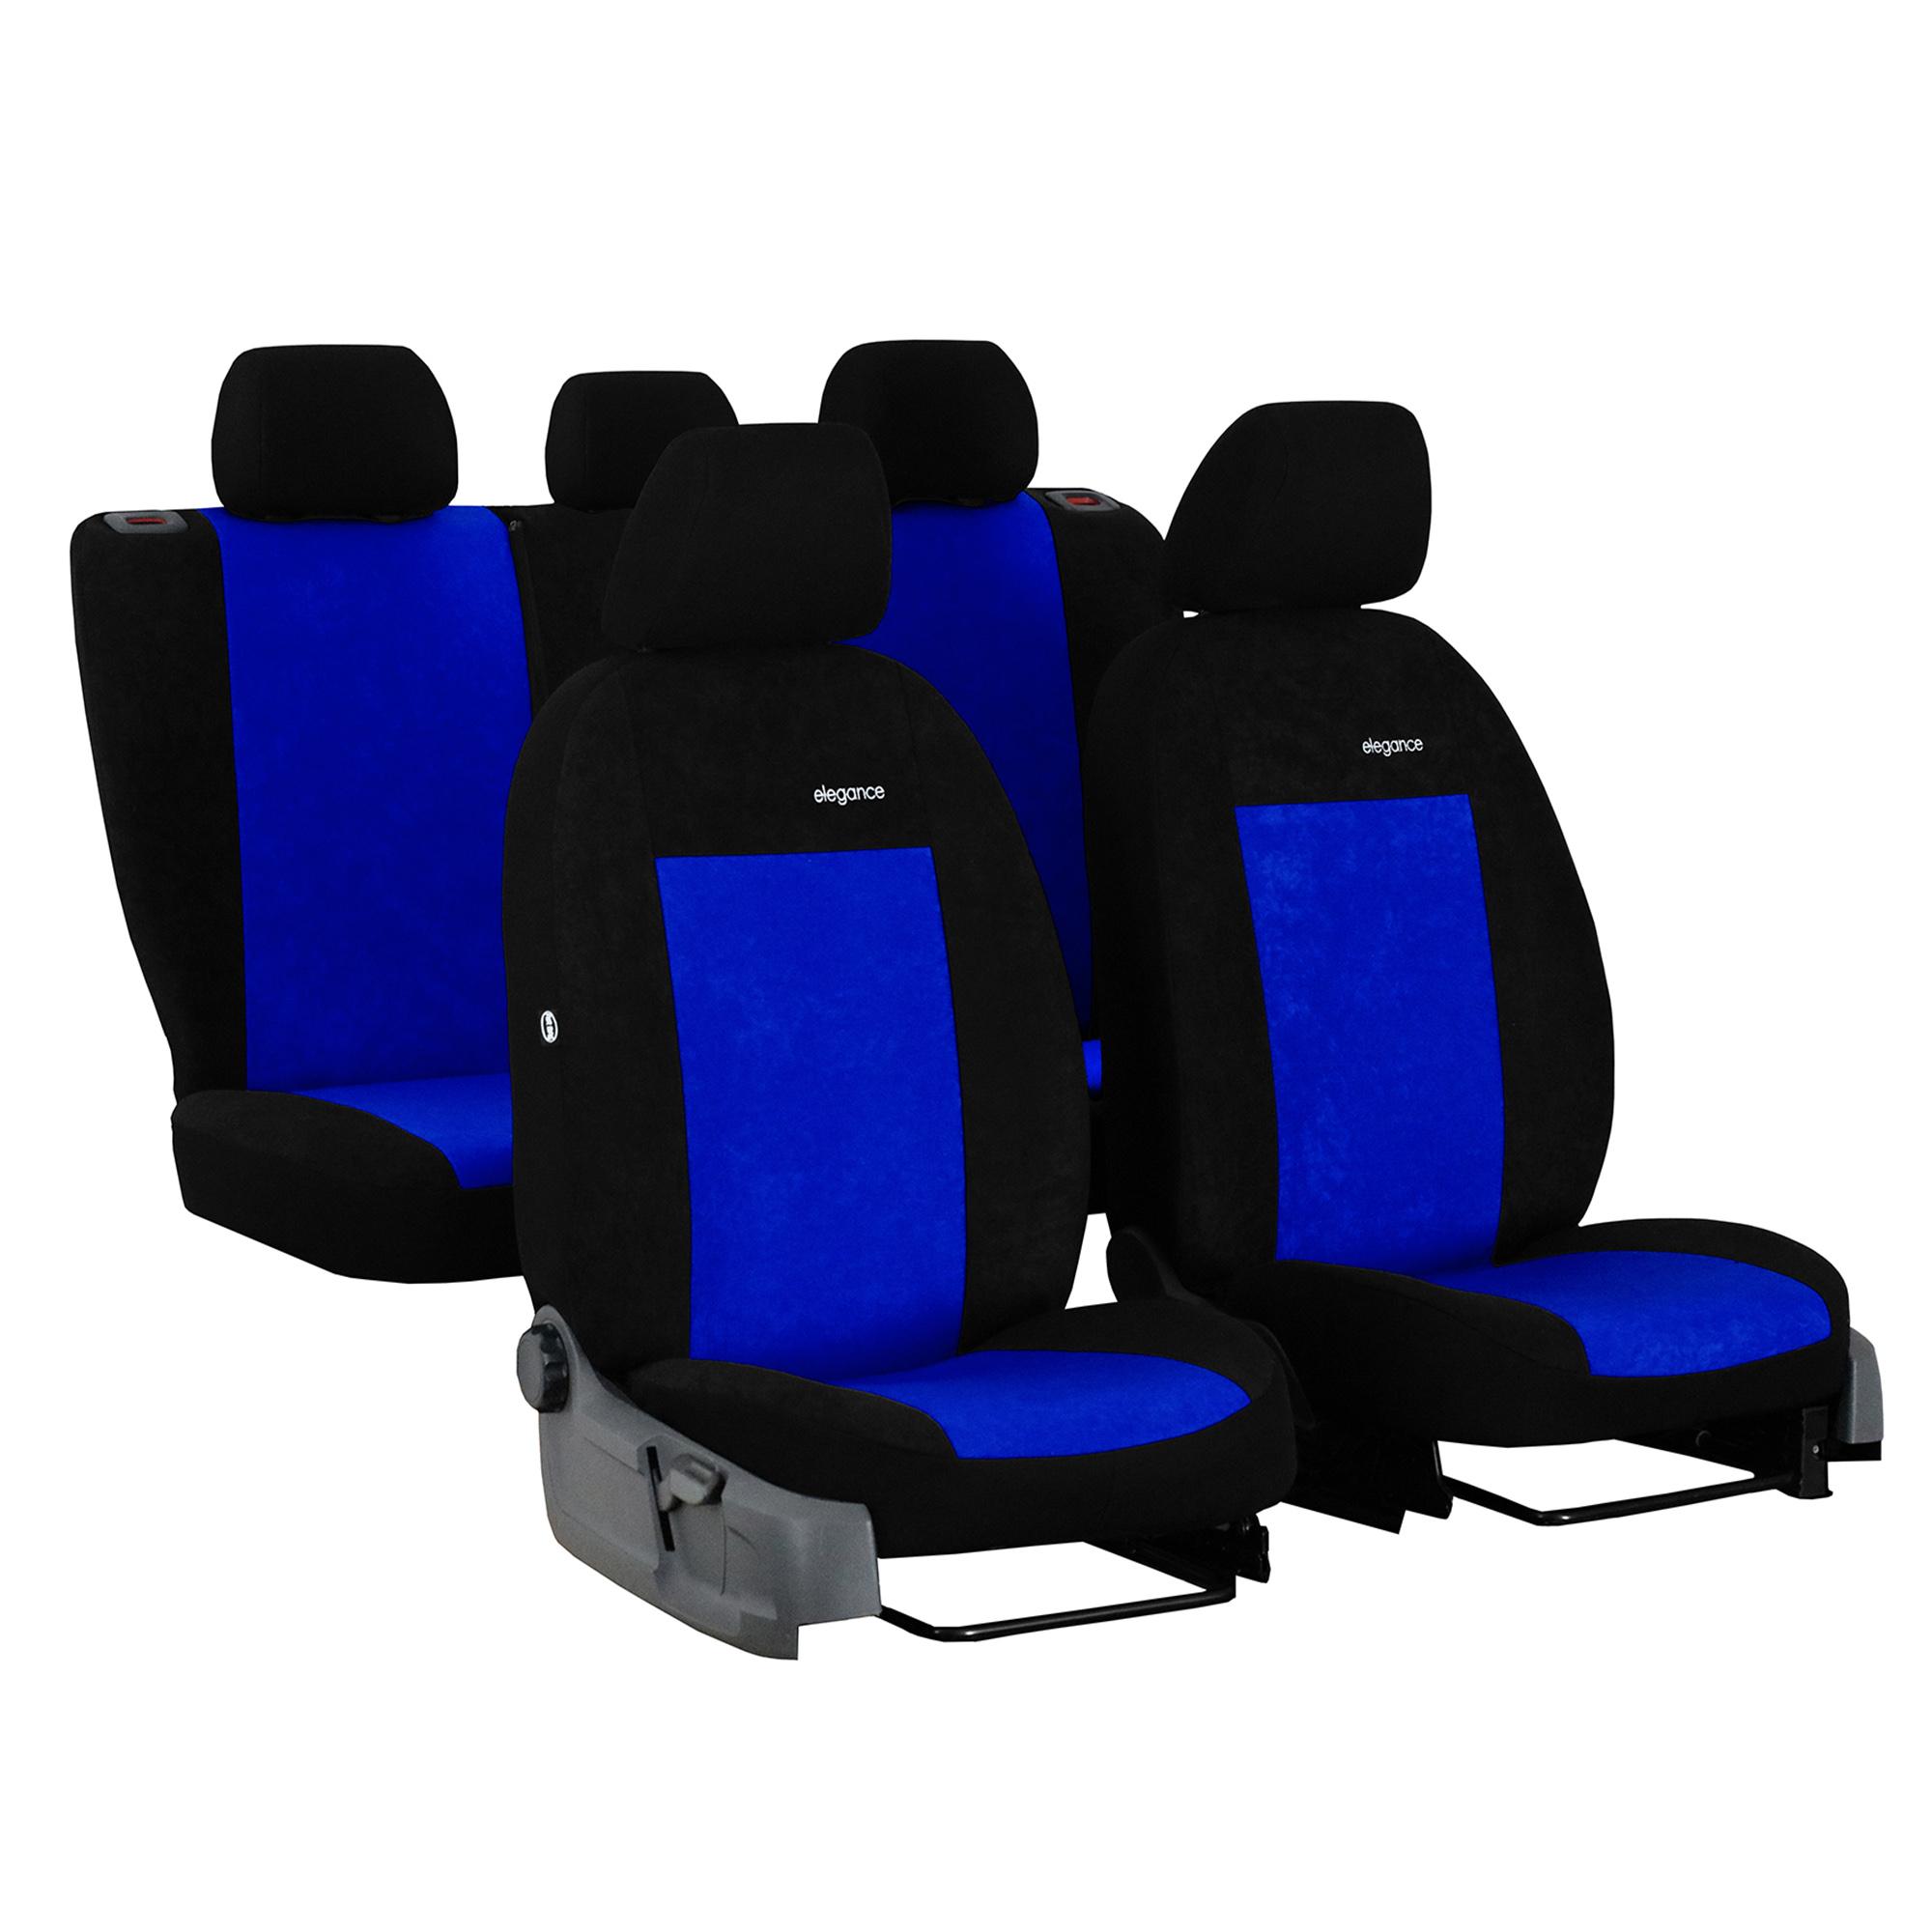 2x LUX Satz Sitzbezüge Schonbezüge Grau für KIA Mazda MINI Mitsubishi Nissan